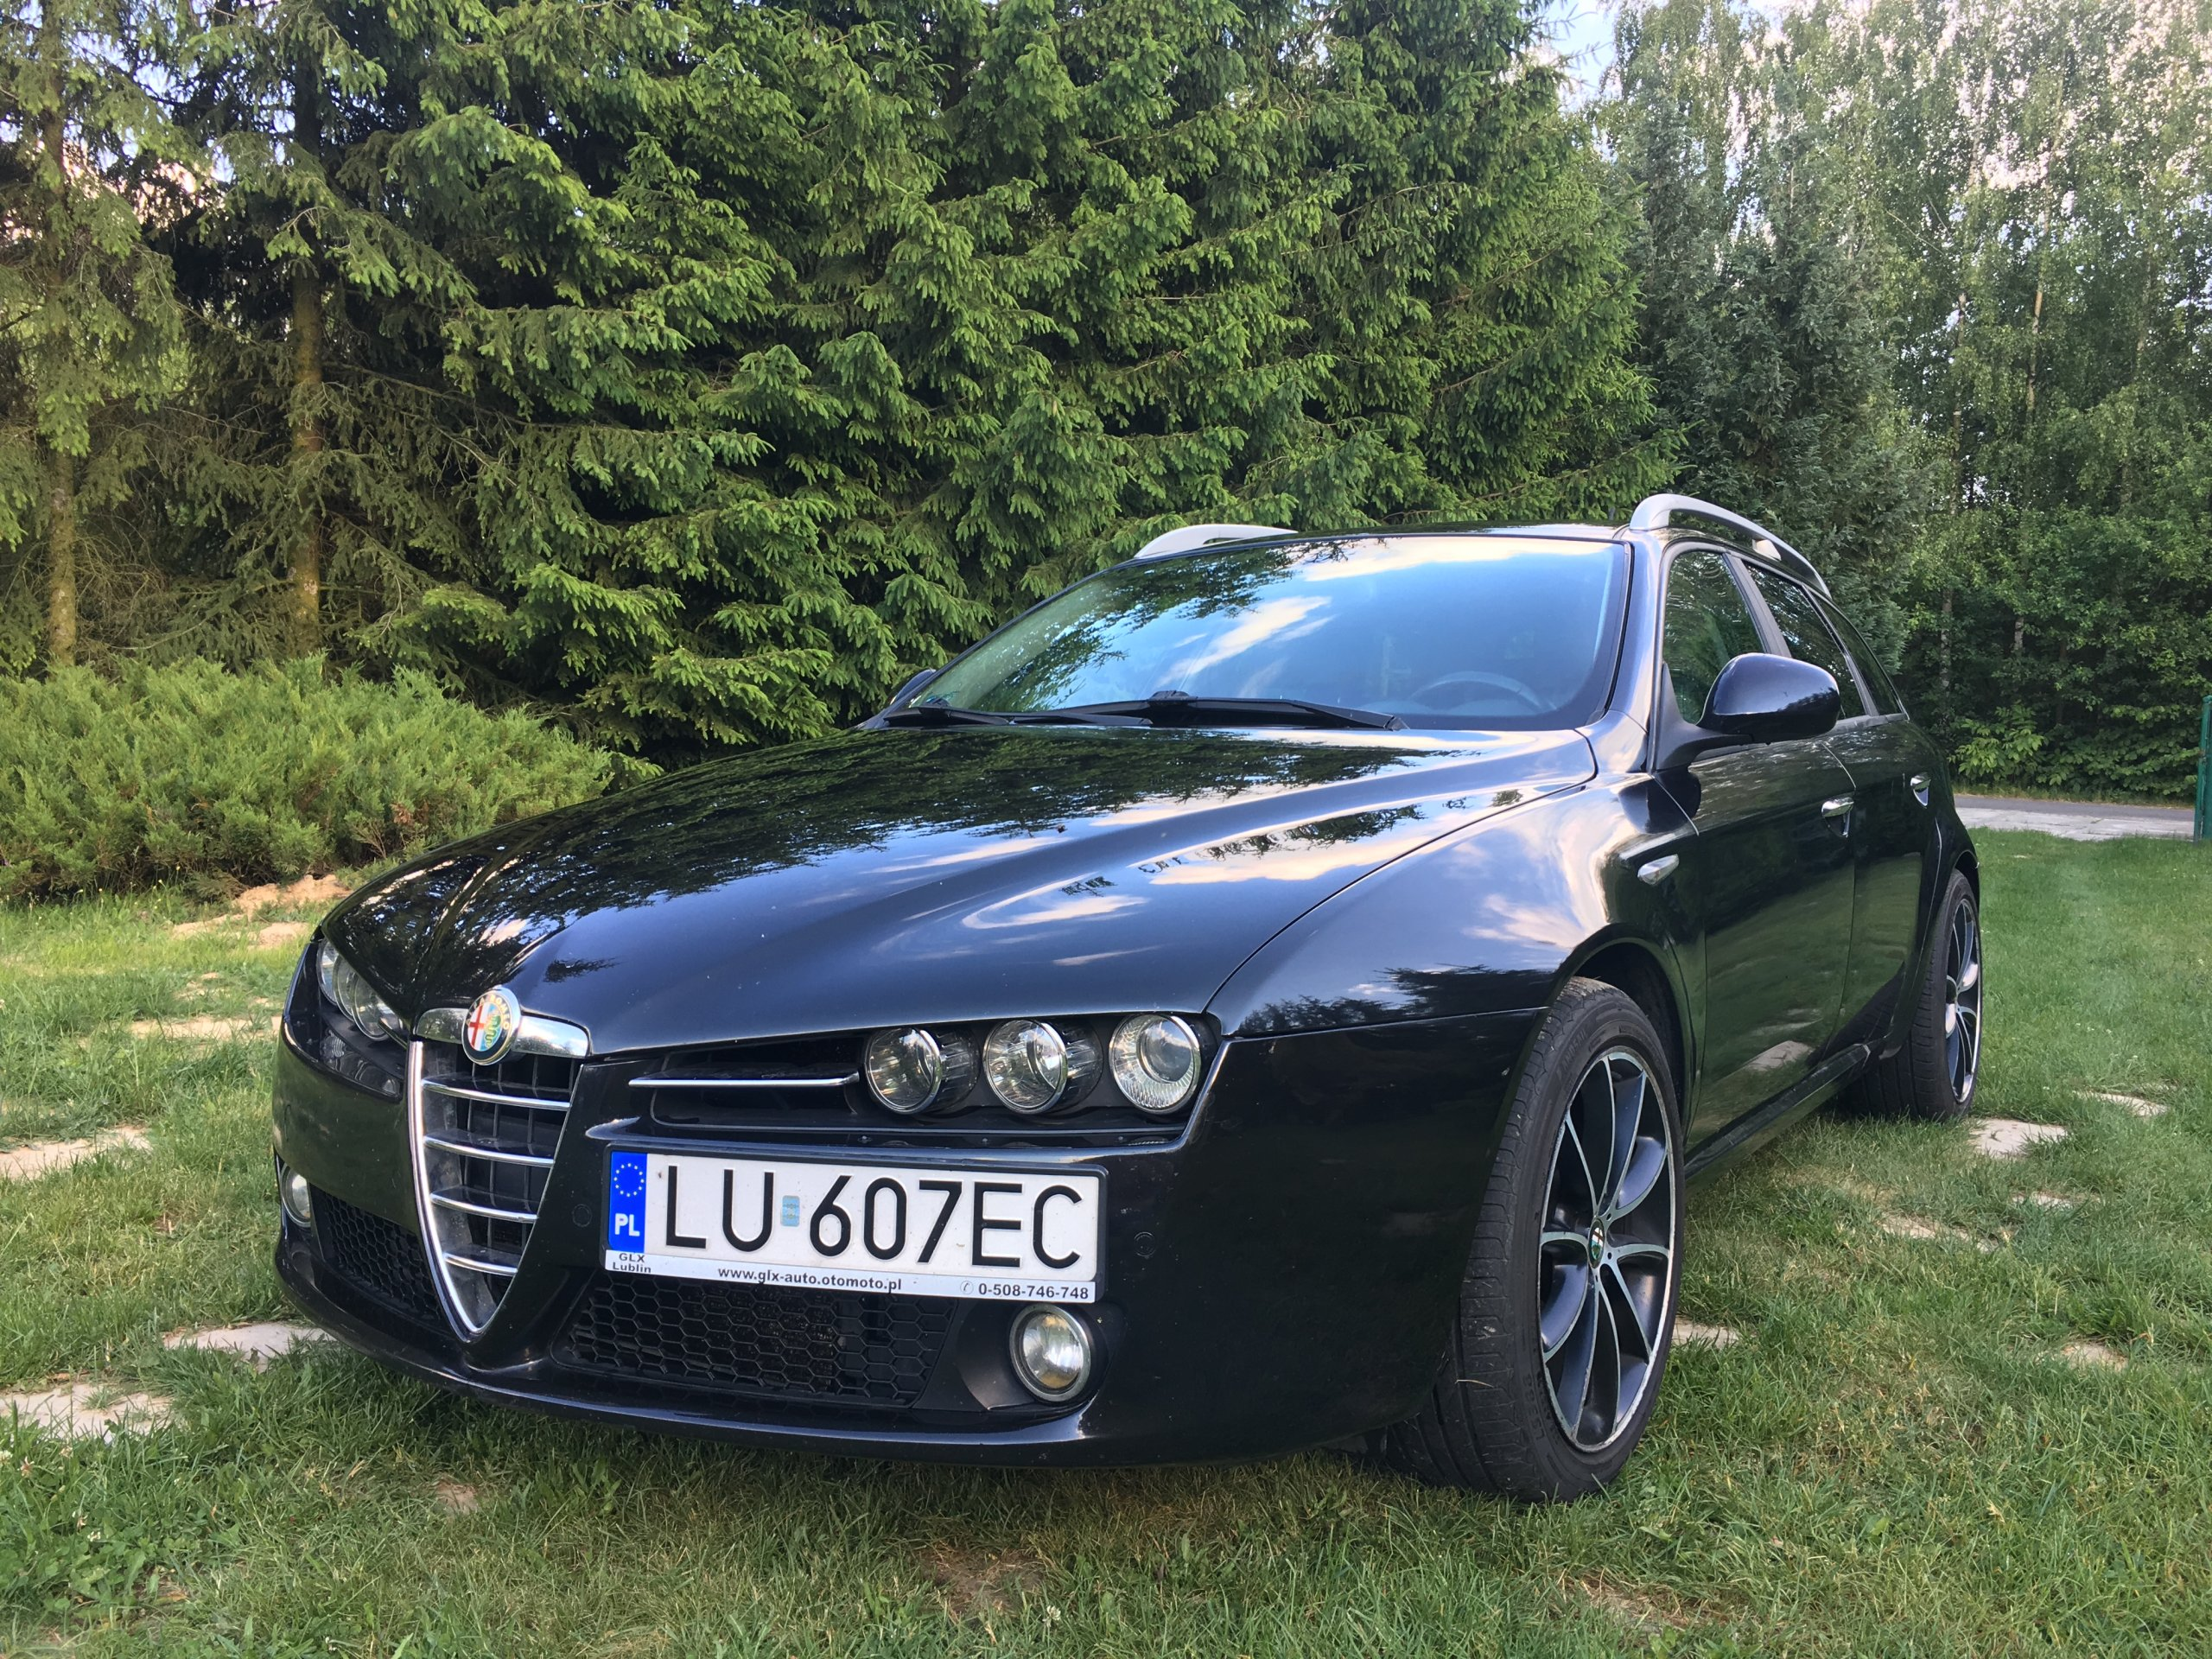 Sprzedam Alfa Romeo 159 oficjalne archiwum allegro